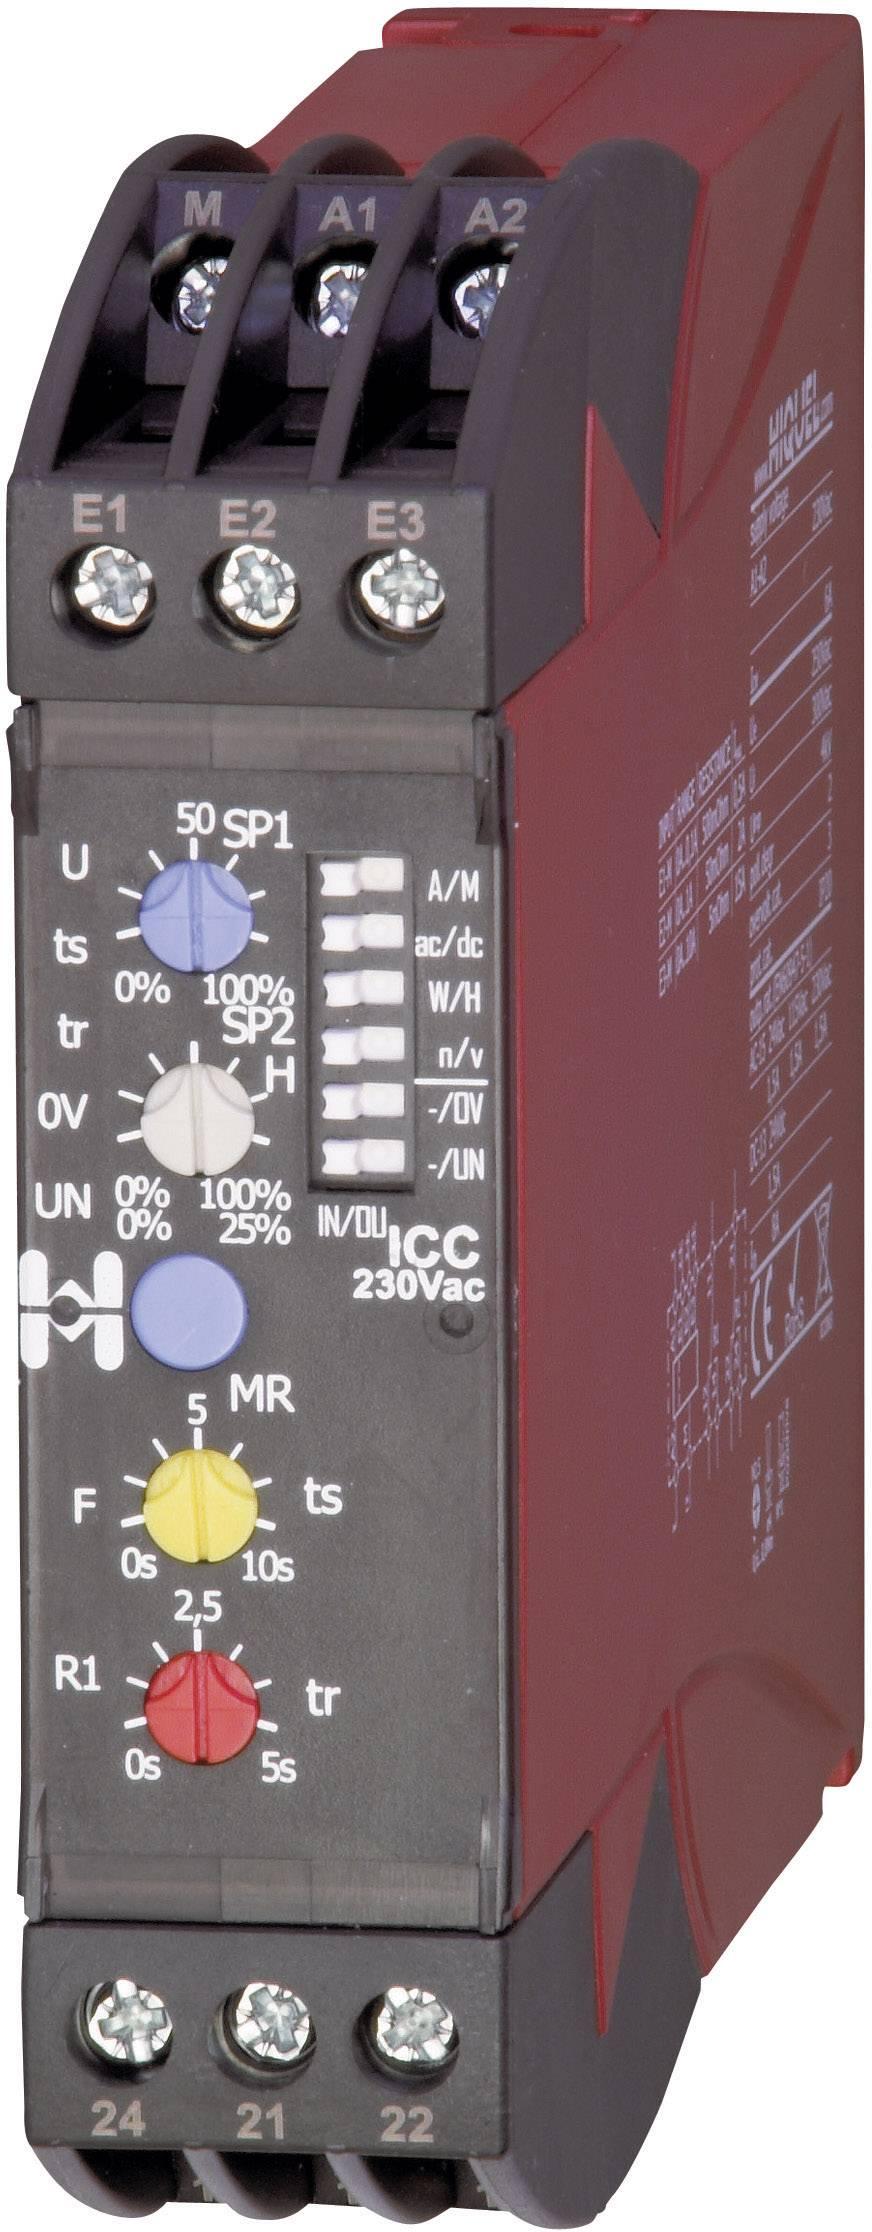 Monitorovací relé in-case Hiquel, ICC 230Vac, in-case